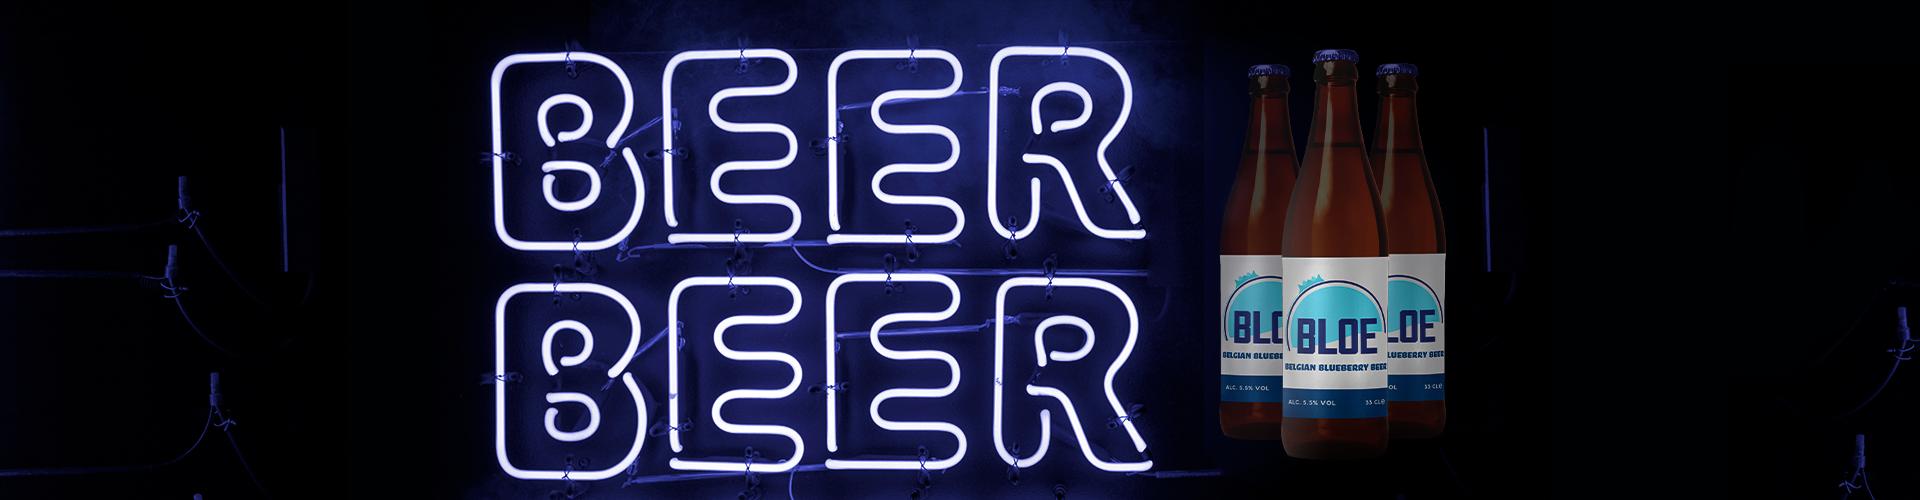 best blueberry beer